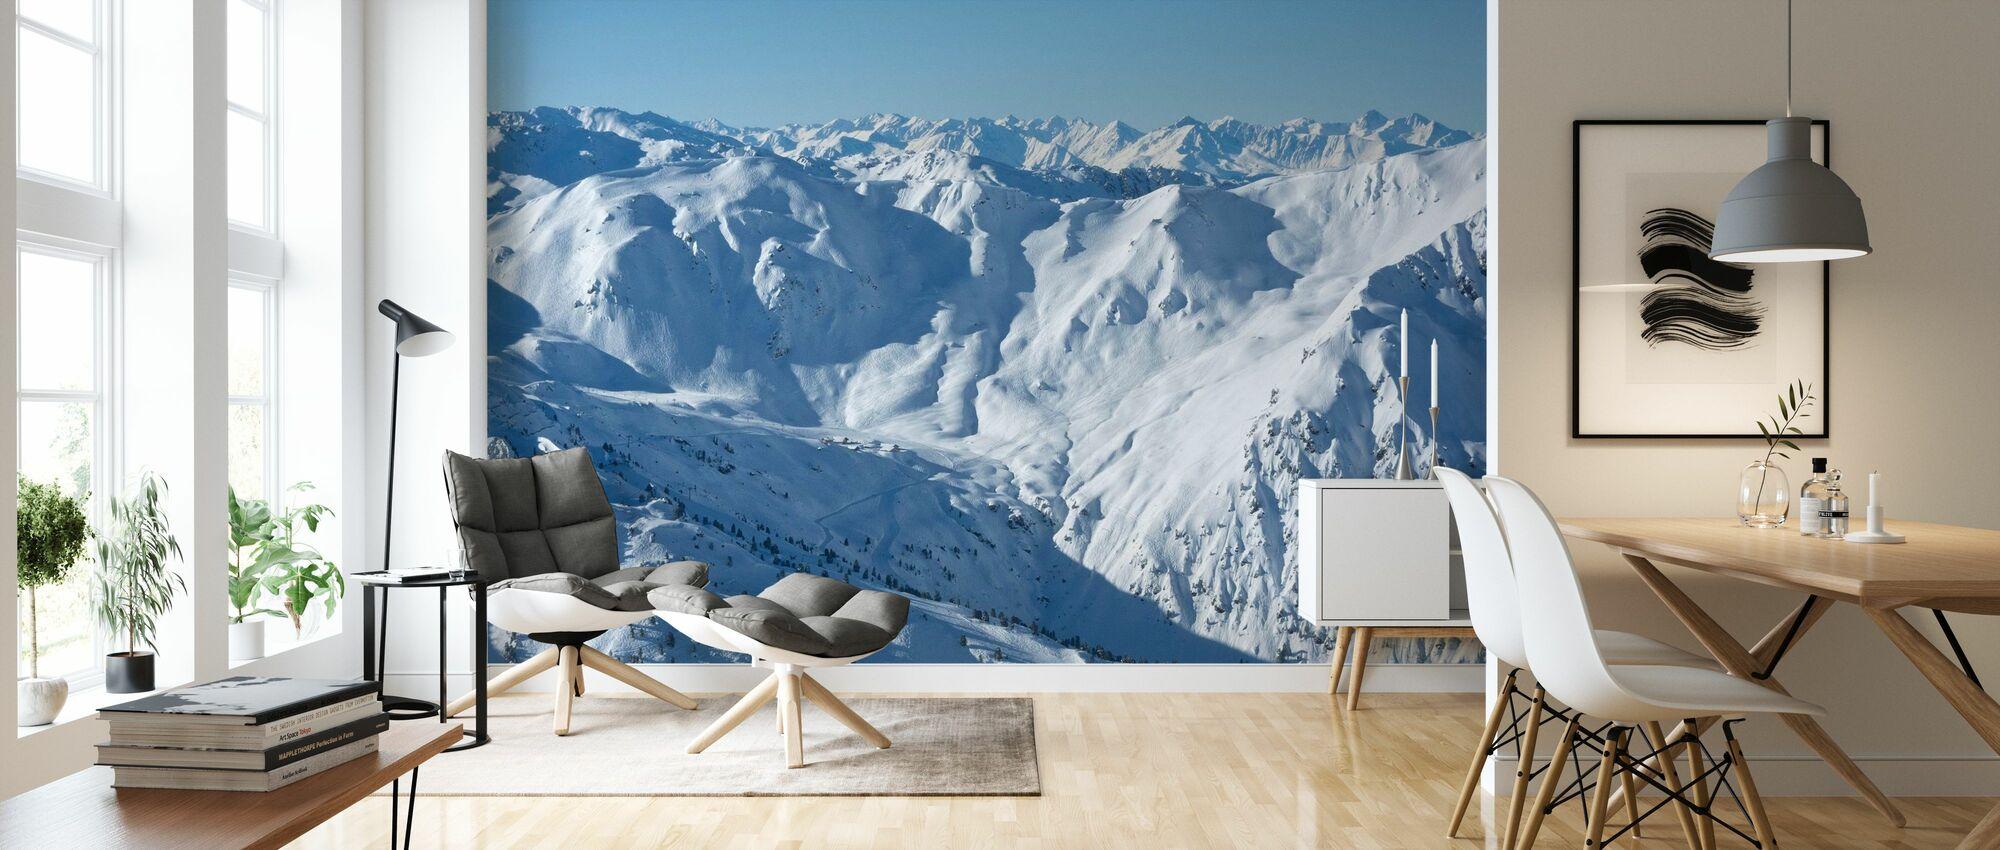 Ski Slopes of Zillertal - Wallpaper - Living Room